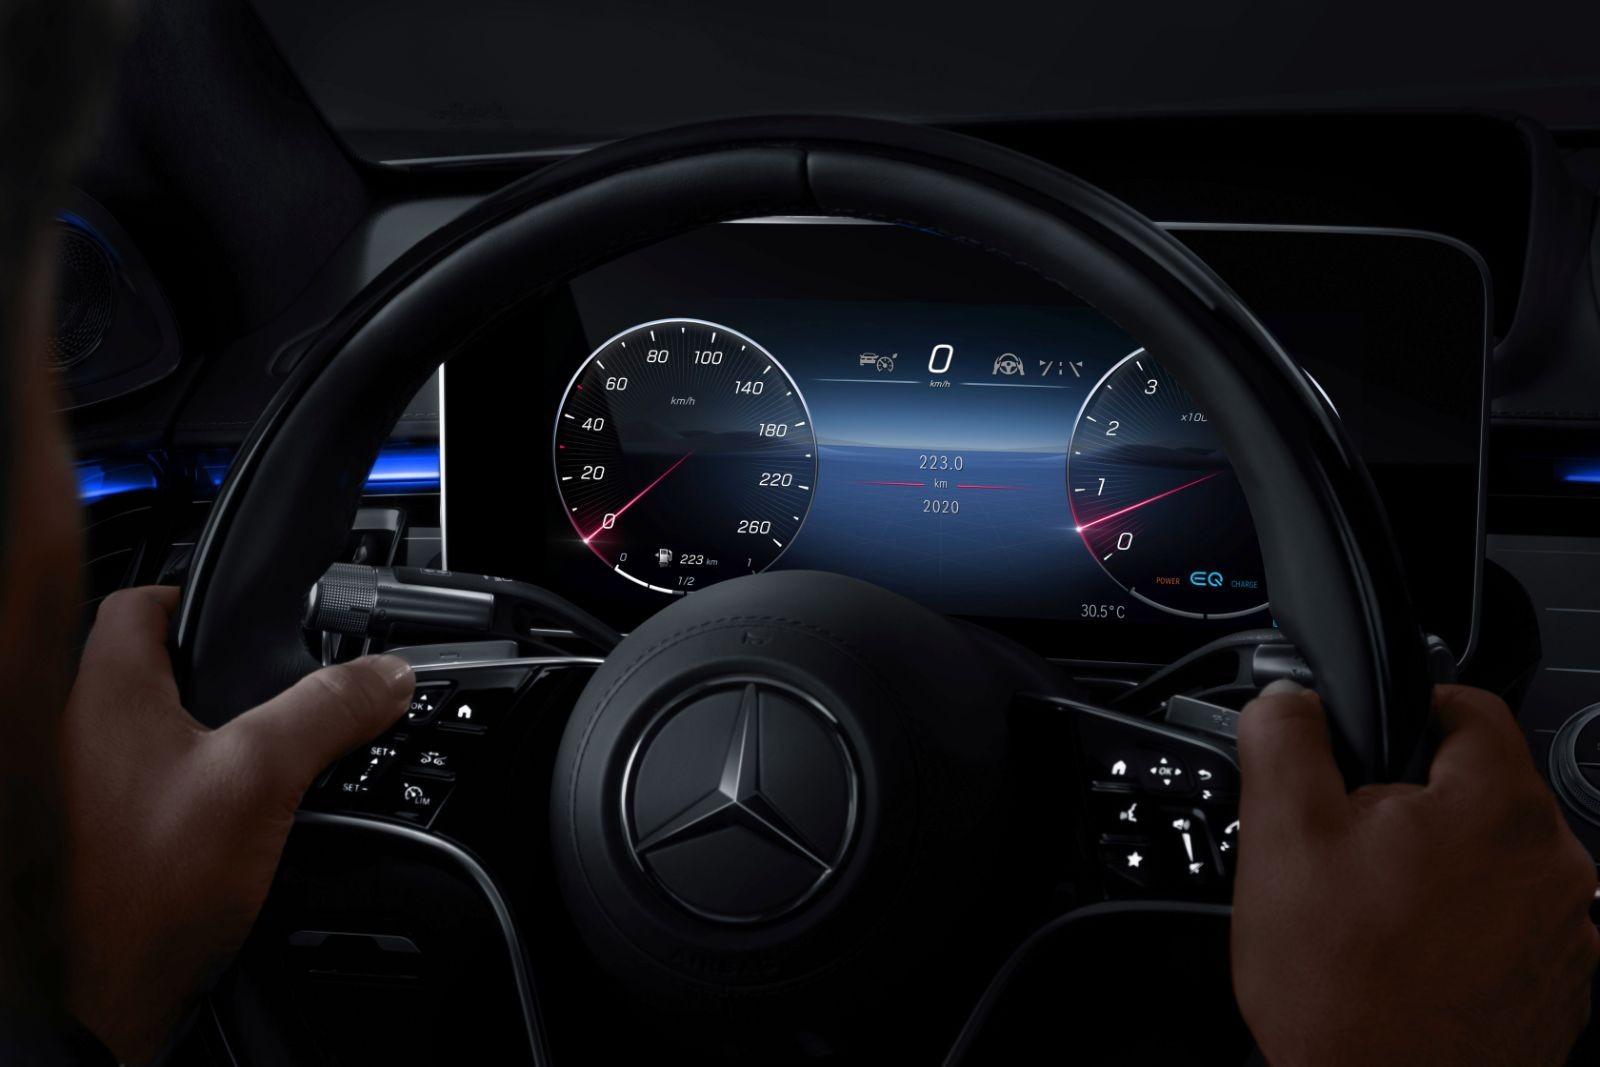 Interior Mercedes-Benz S-Class - Interior Mercedes-Benz S-Class